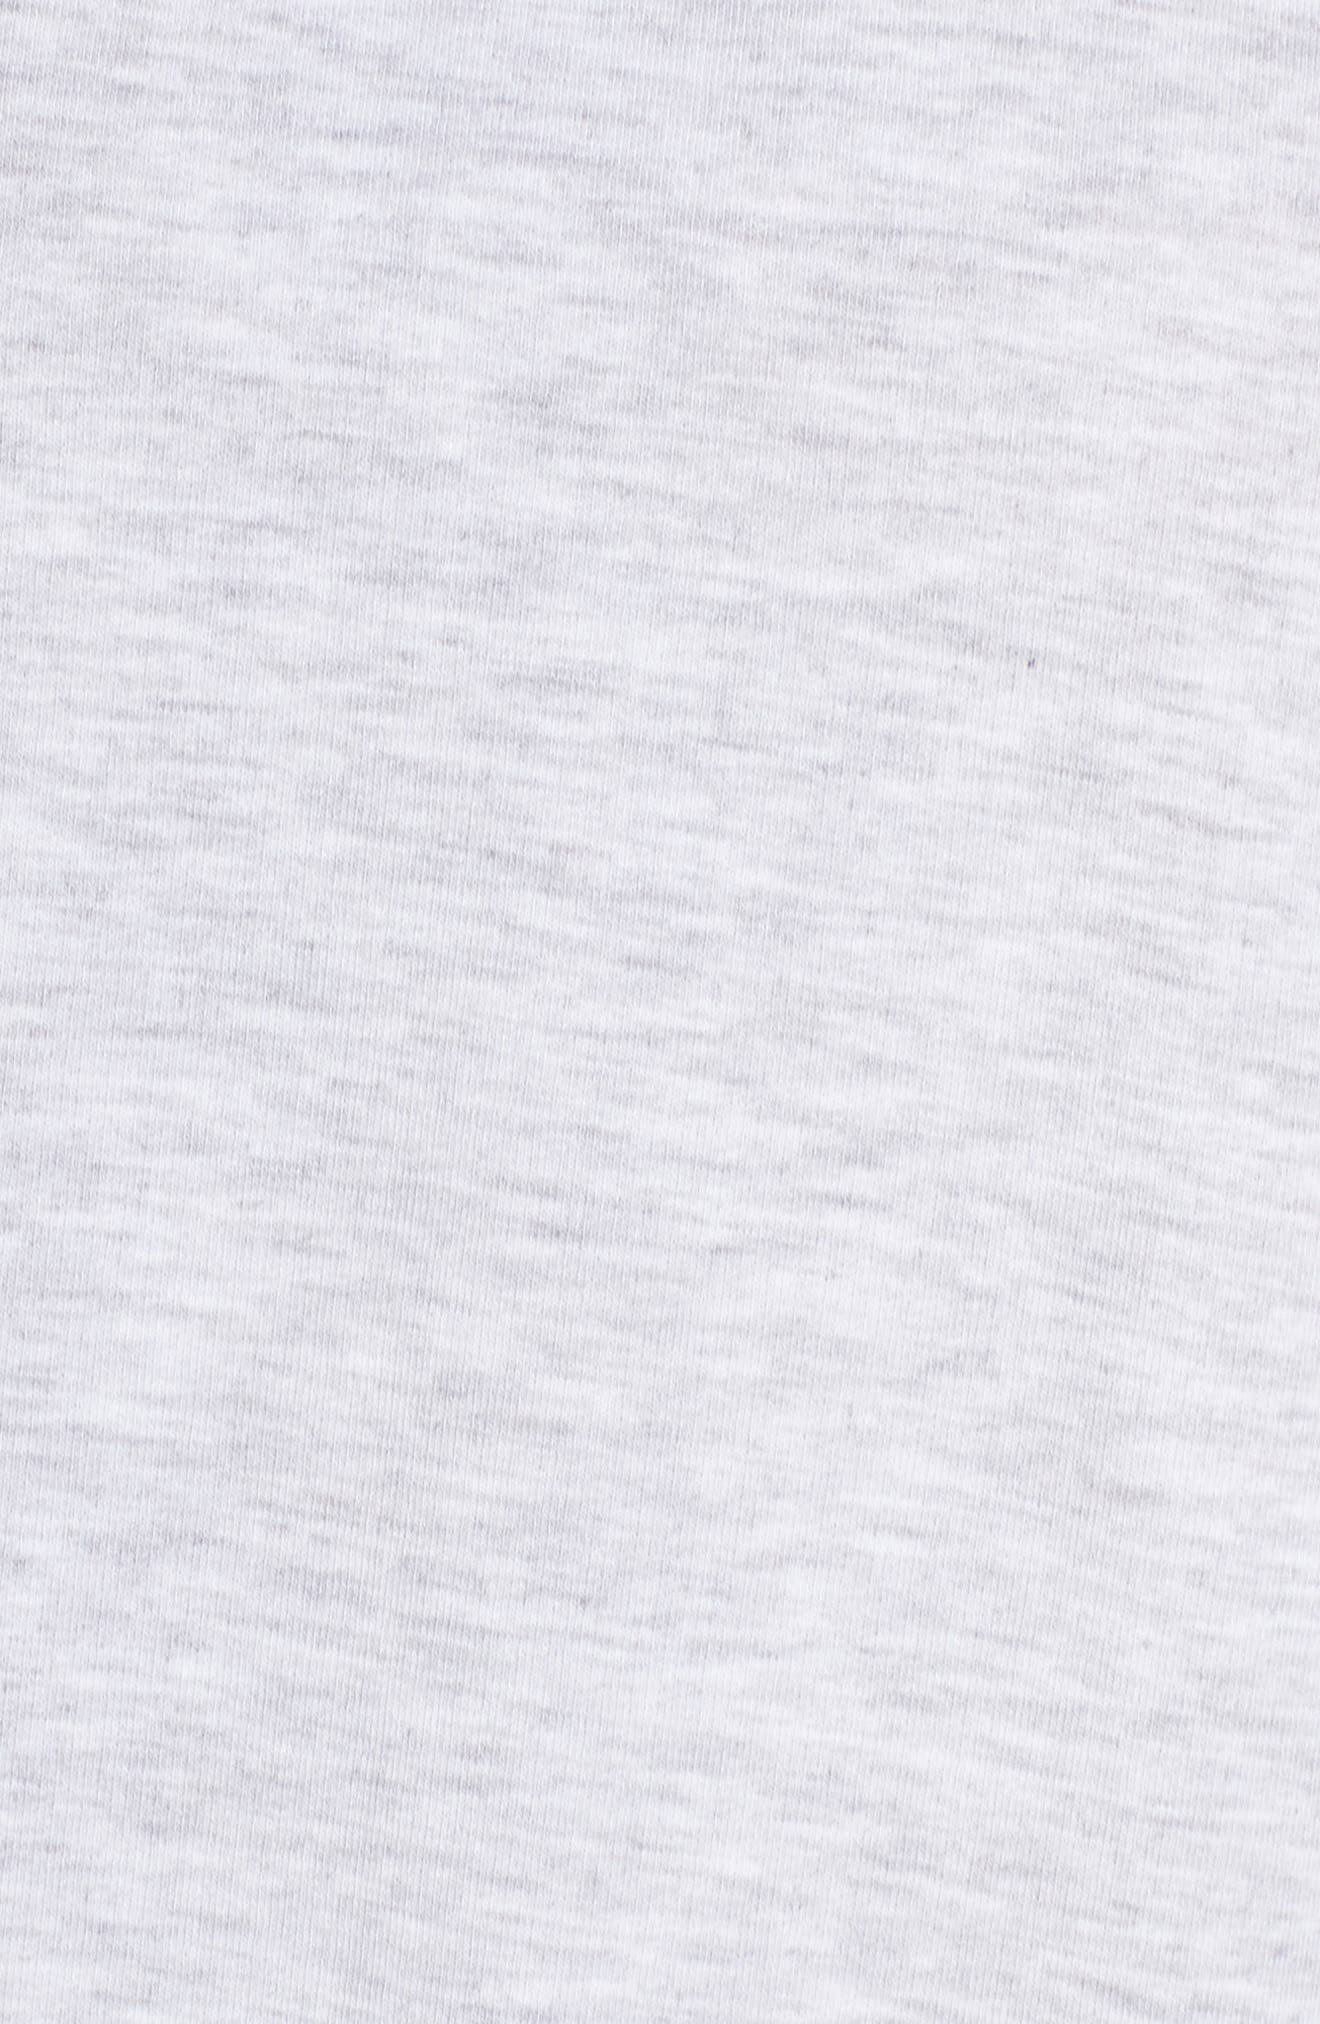 Cool Touch Sweatshirt,                             Alternate thumbnail 5, color,                             020